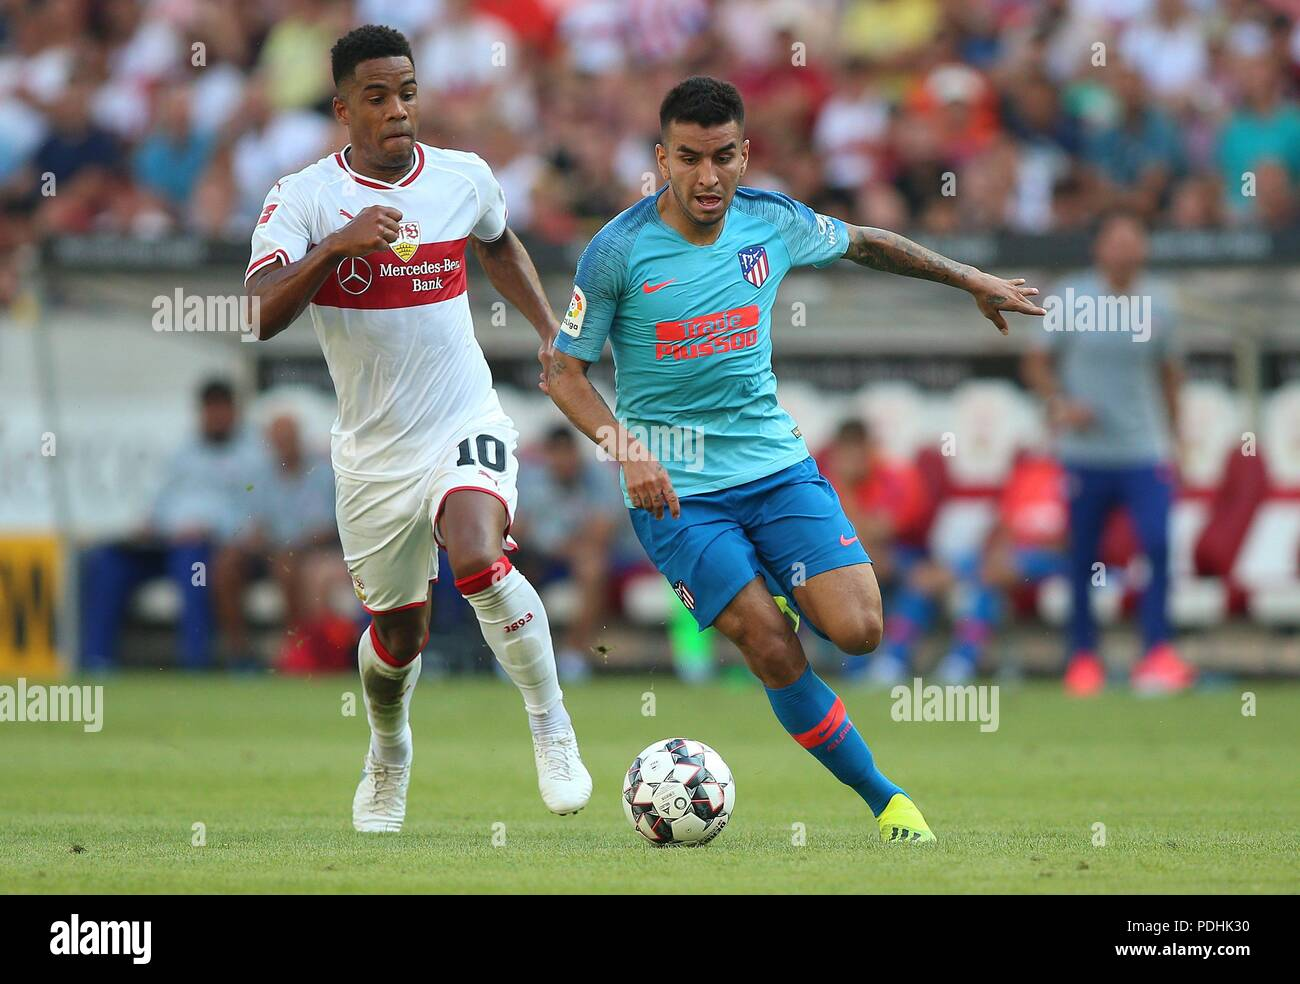 Firo 05082018 Fußball Saison 20182019 1 Bundesliga Vfb